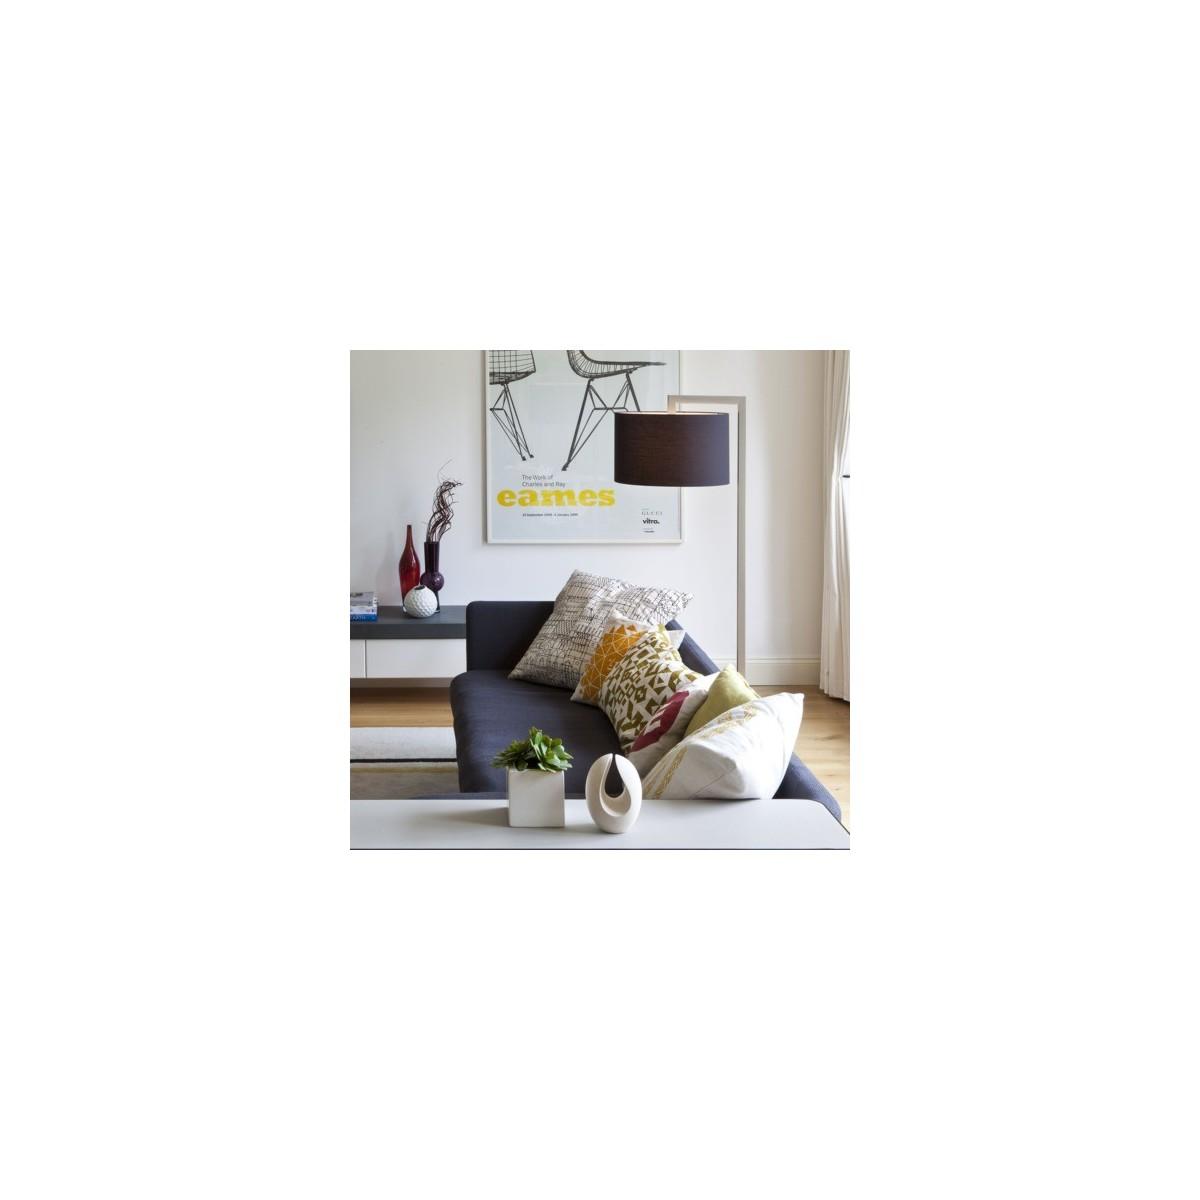 Astro Ravello Floor Podłogowa 1x60W Max E27 Brąz 1222003